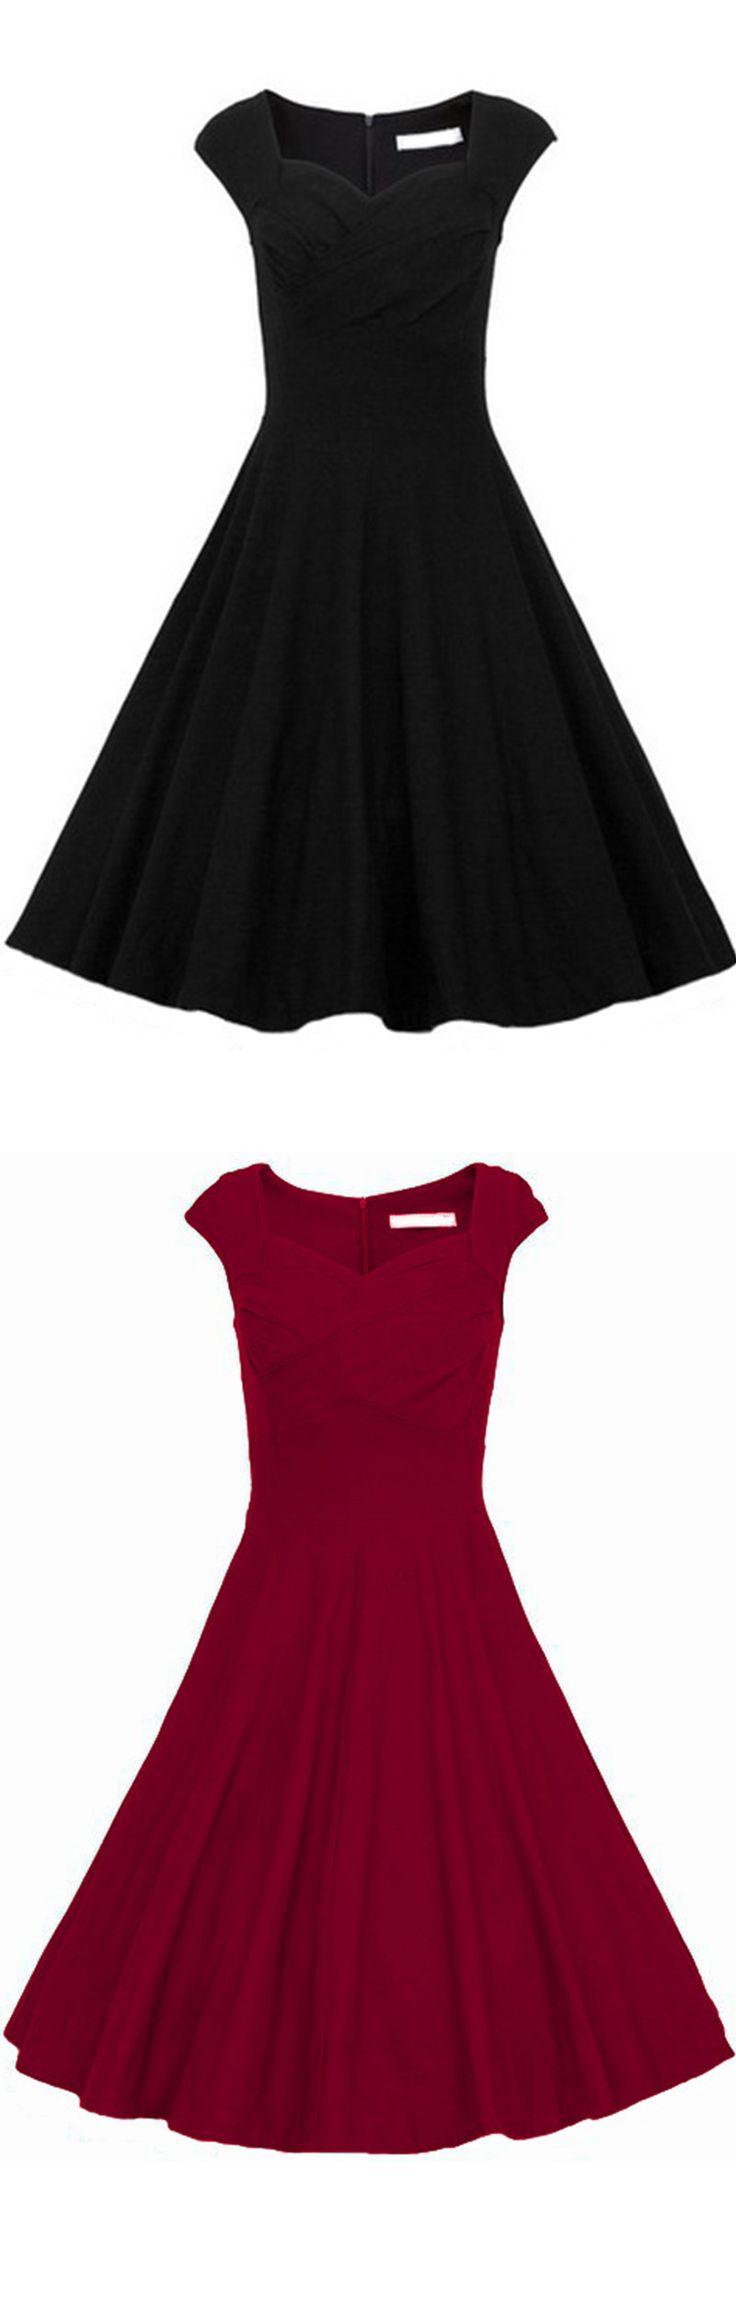 Classic vintage plain black a line dress at romwe.com.So beautiful dress for…